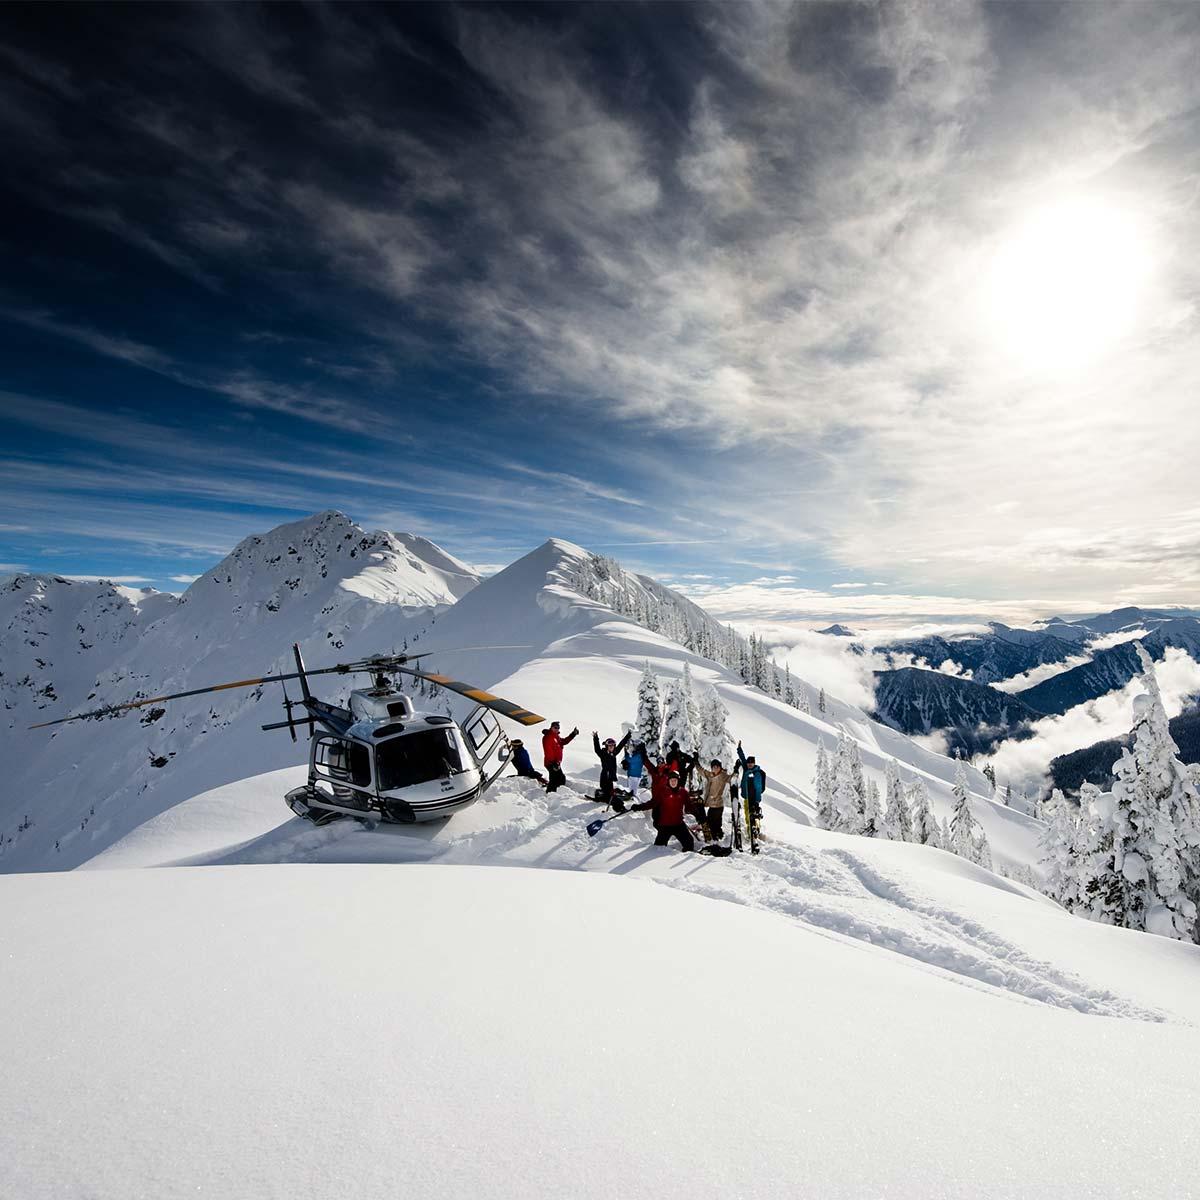 Selkirk Tangiers Heli Skiing Revelstoke Bc Canada